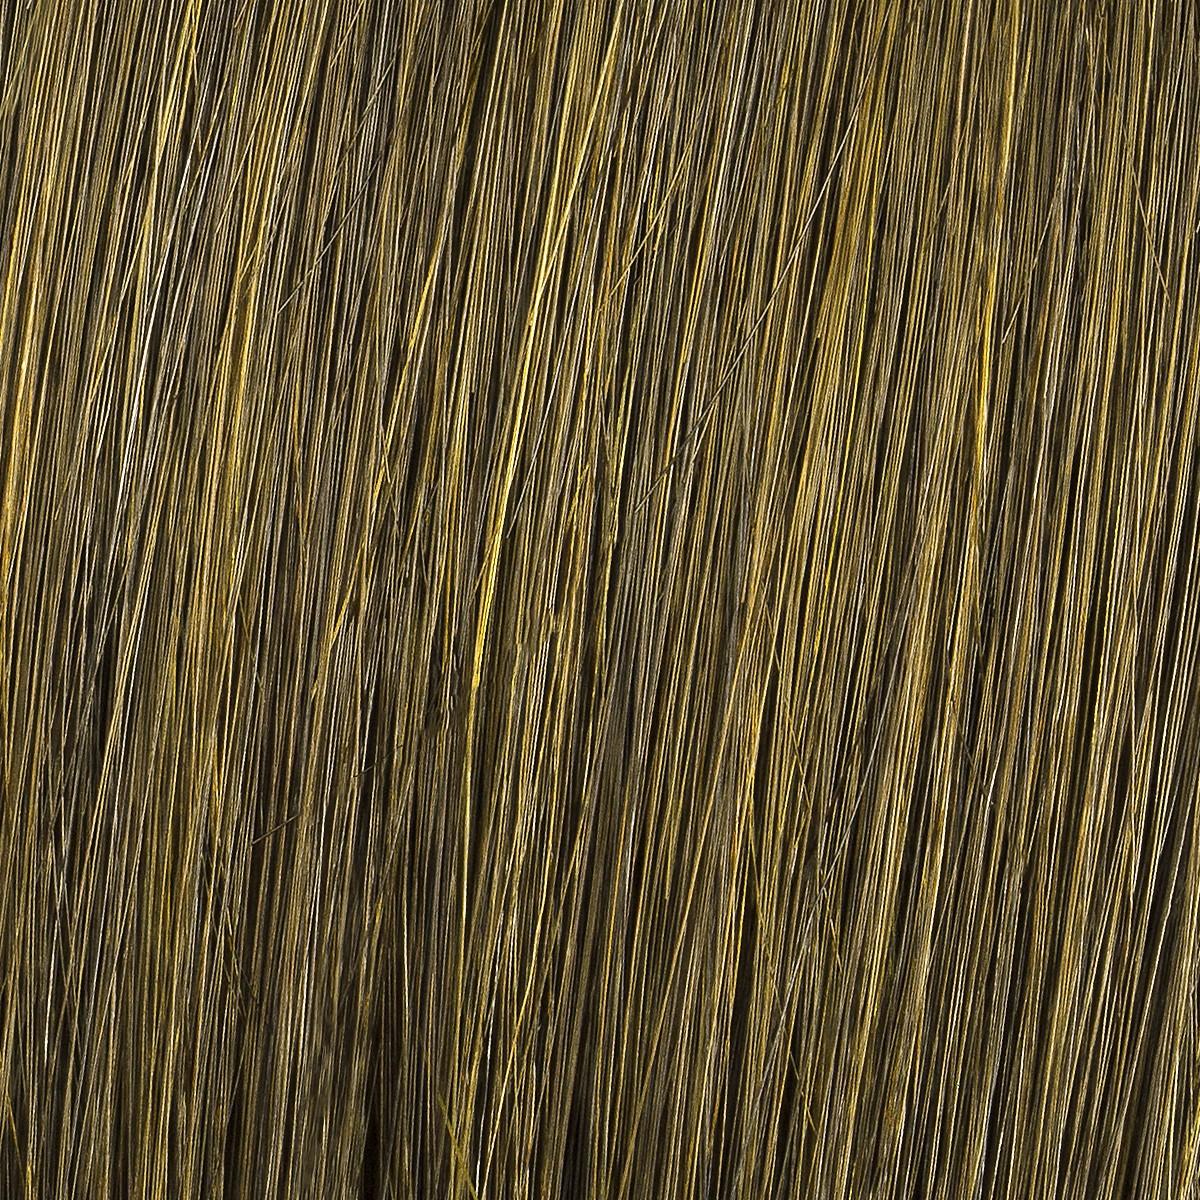 R5HH Light Reddish Brown Human Hair